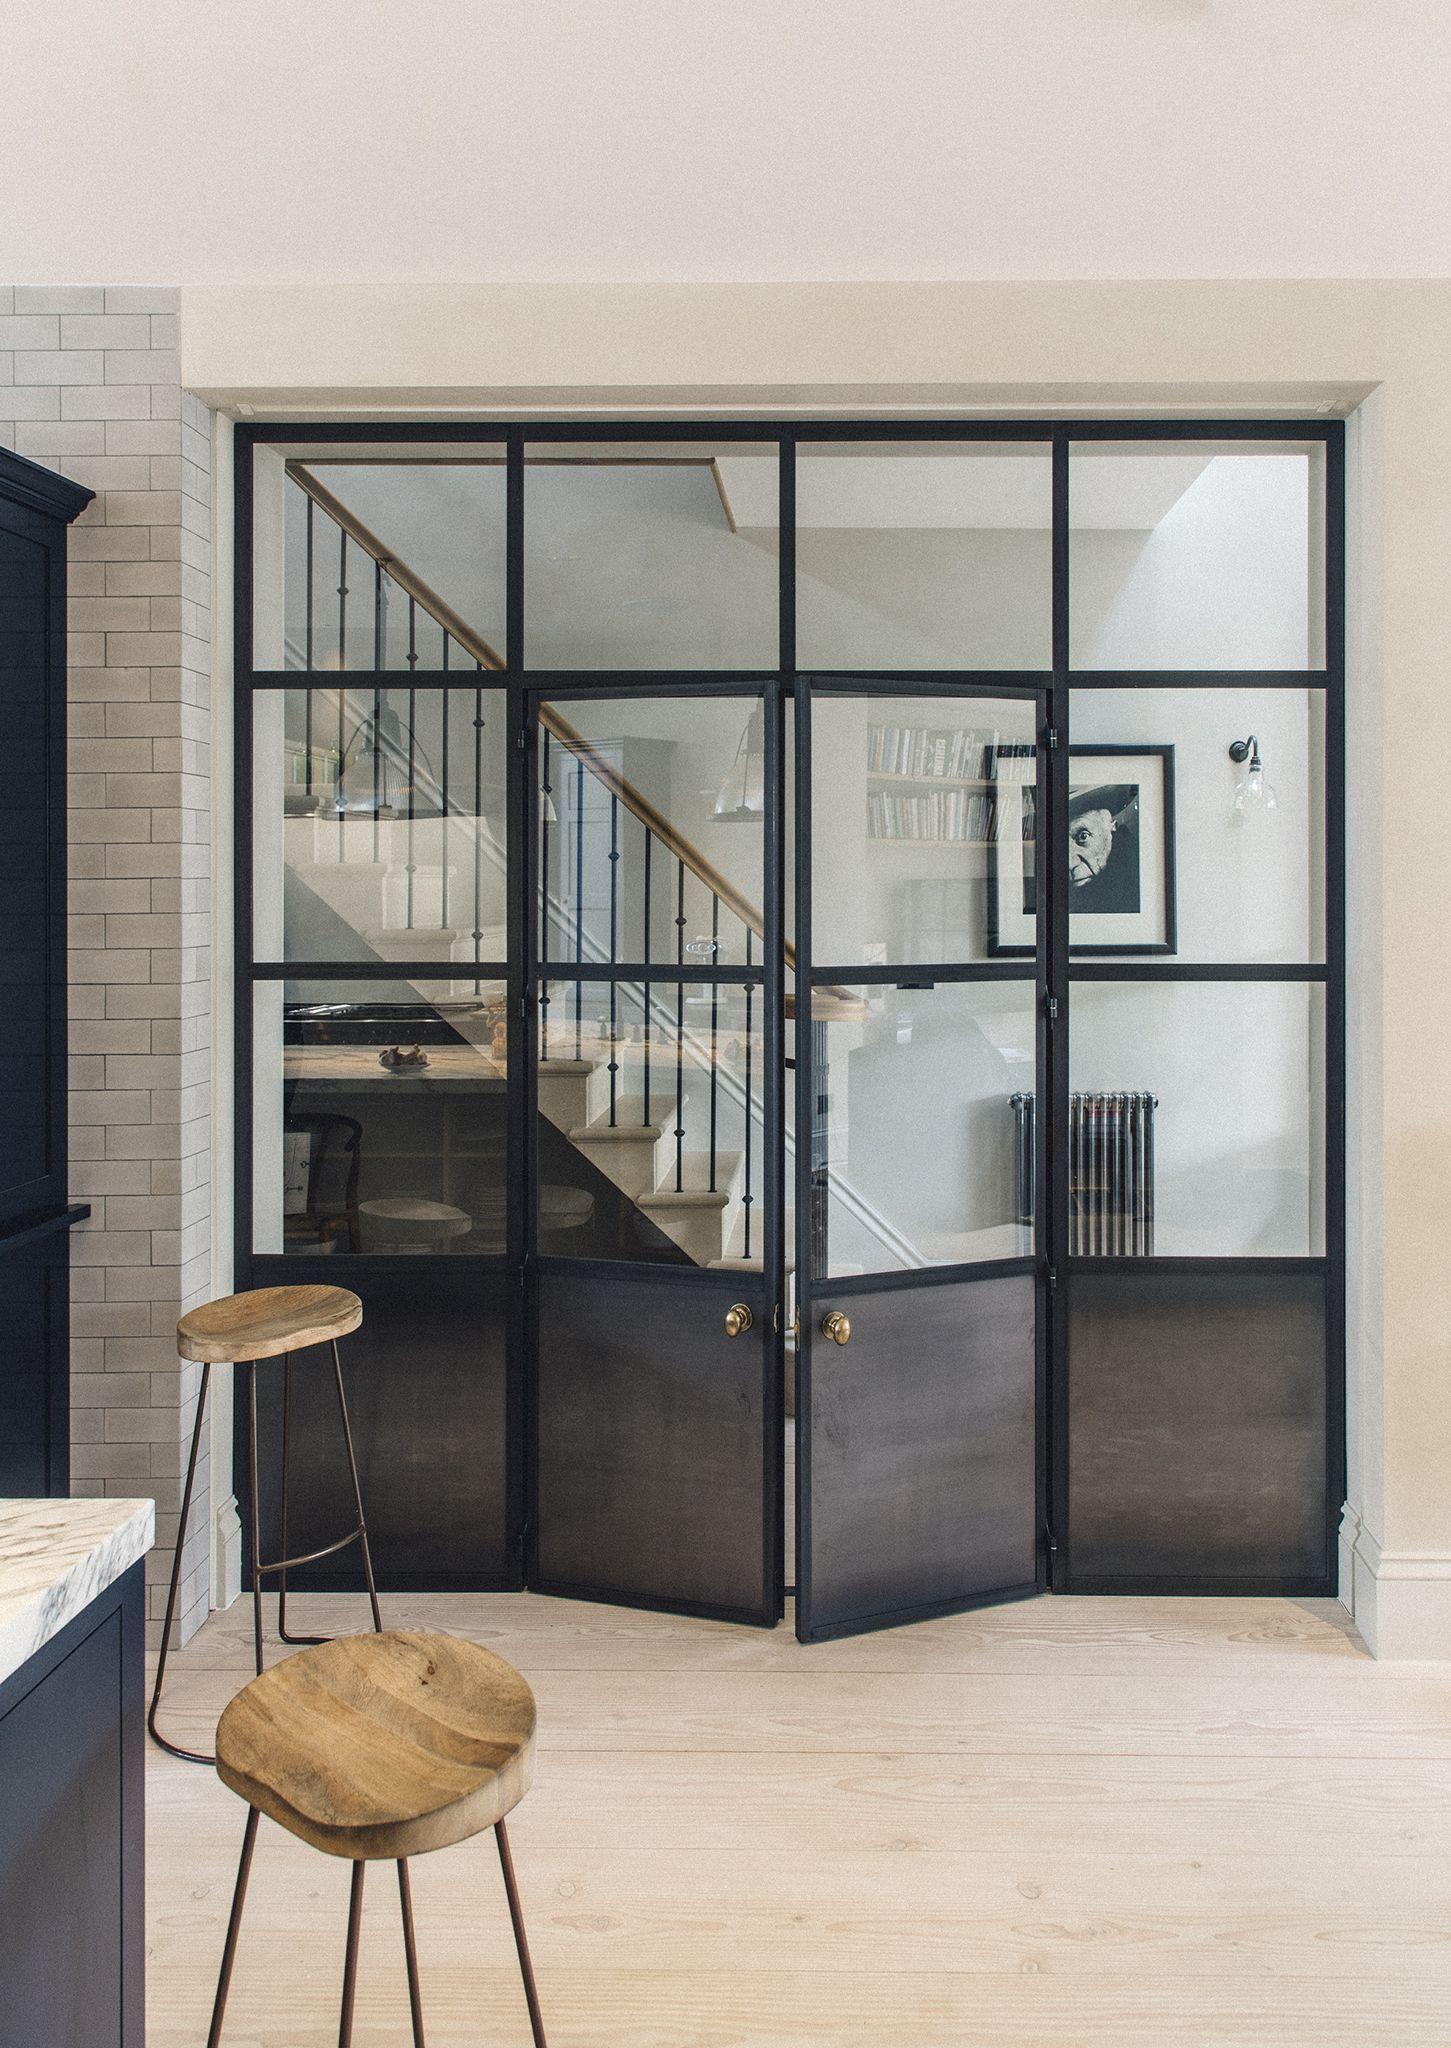 Plain English Bespoke Metal And Glass Doors Made To Order For Plain English Clients Luxurybedroomdoors Raumteilerturen